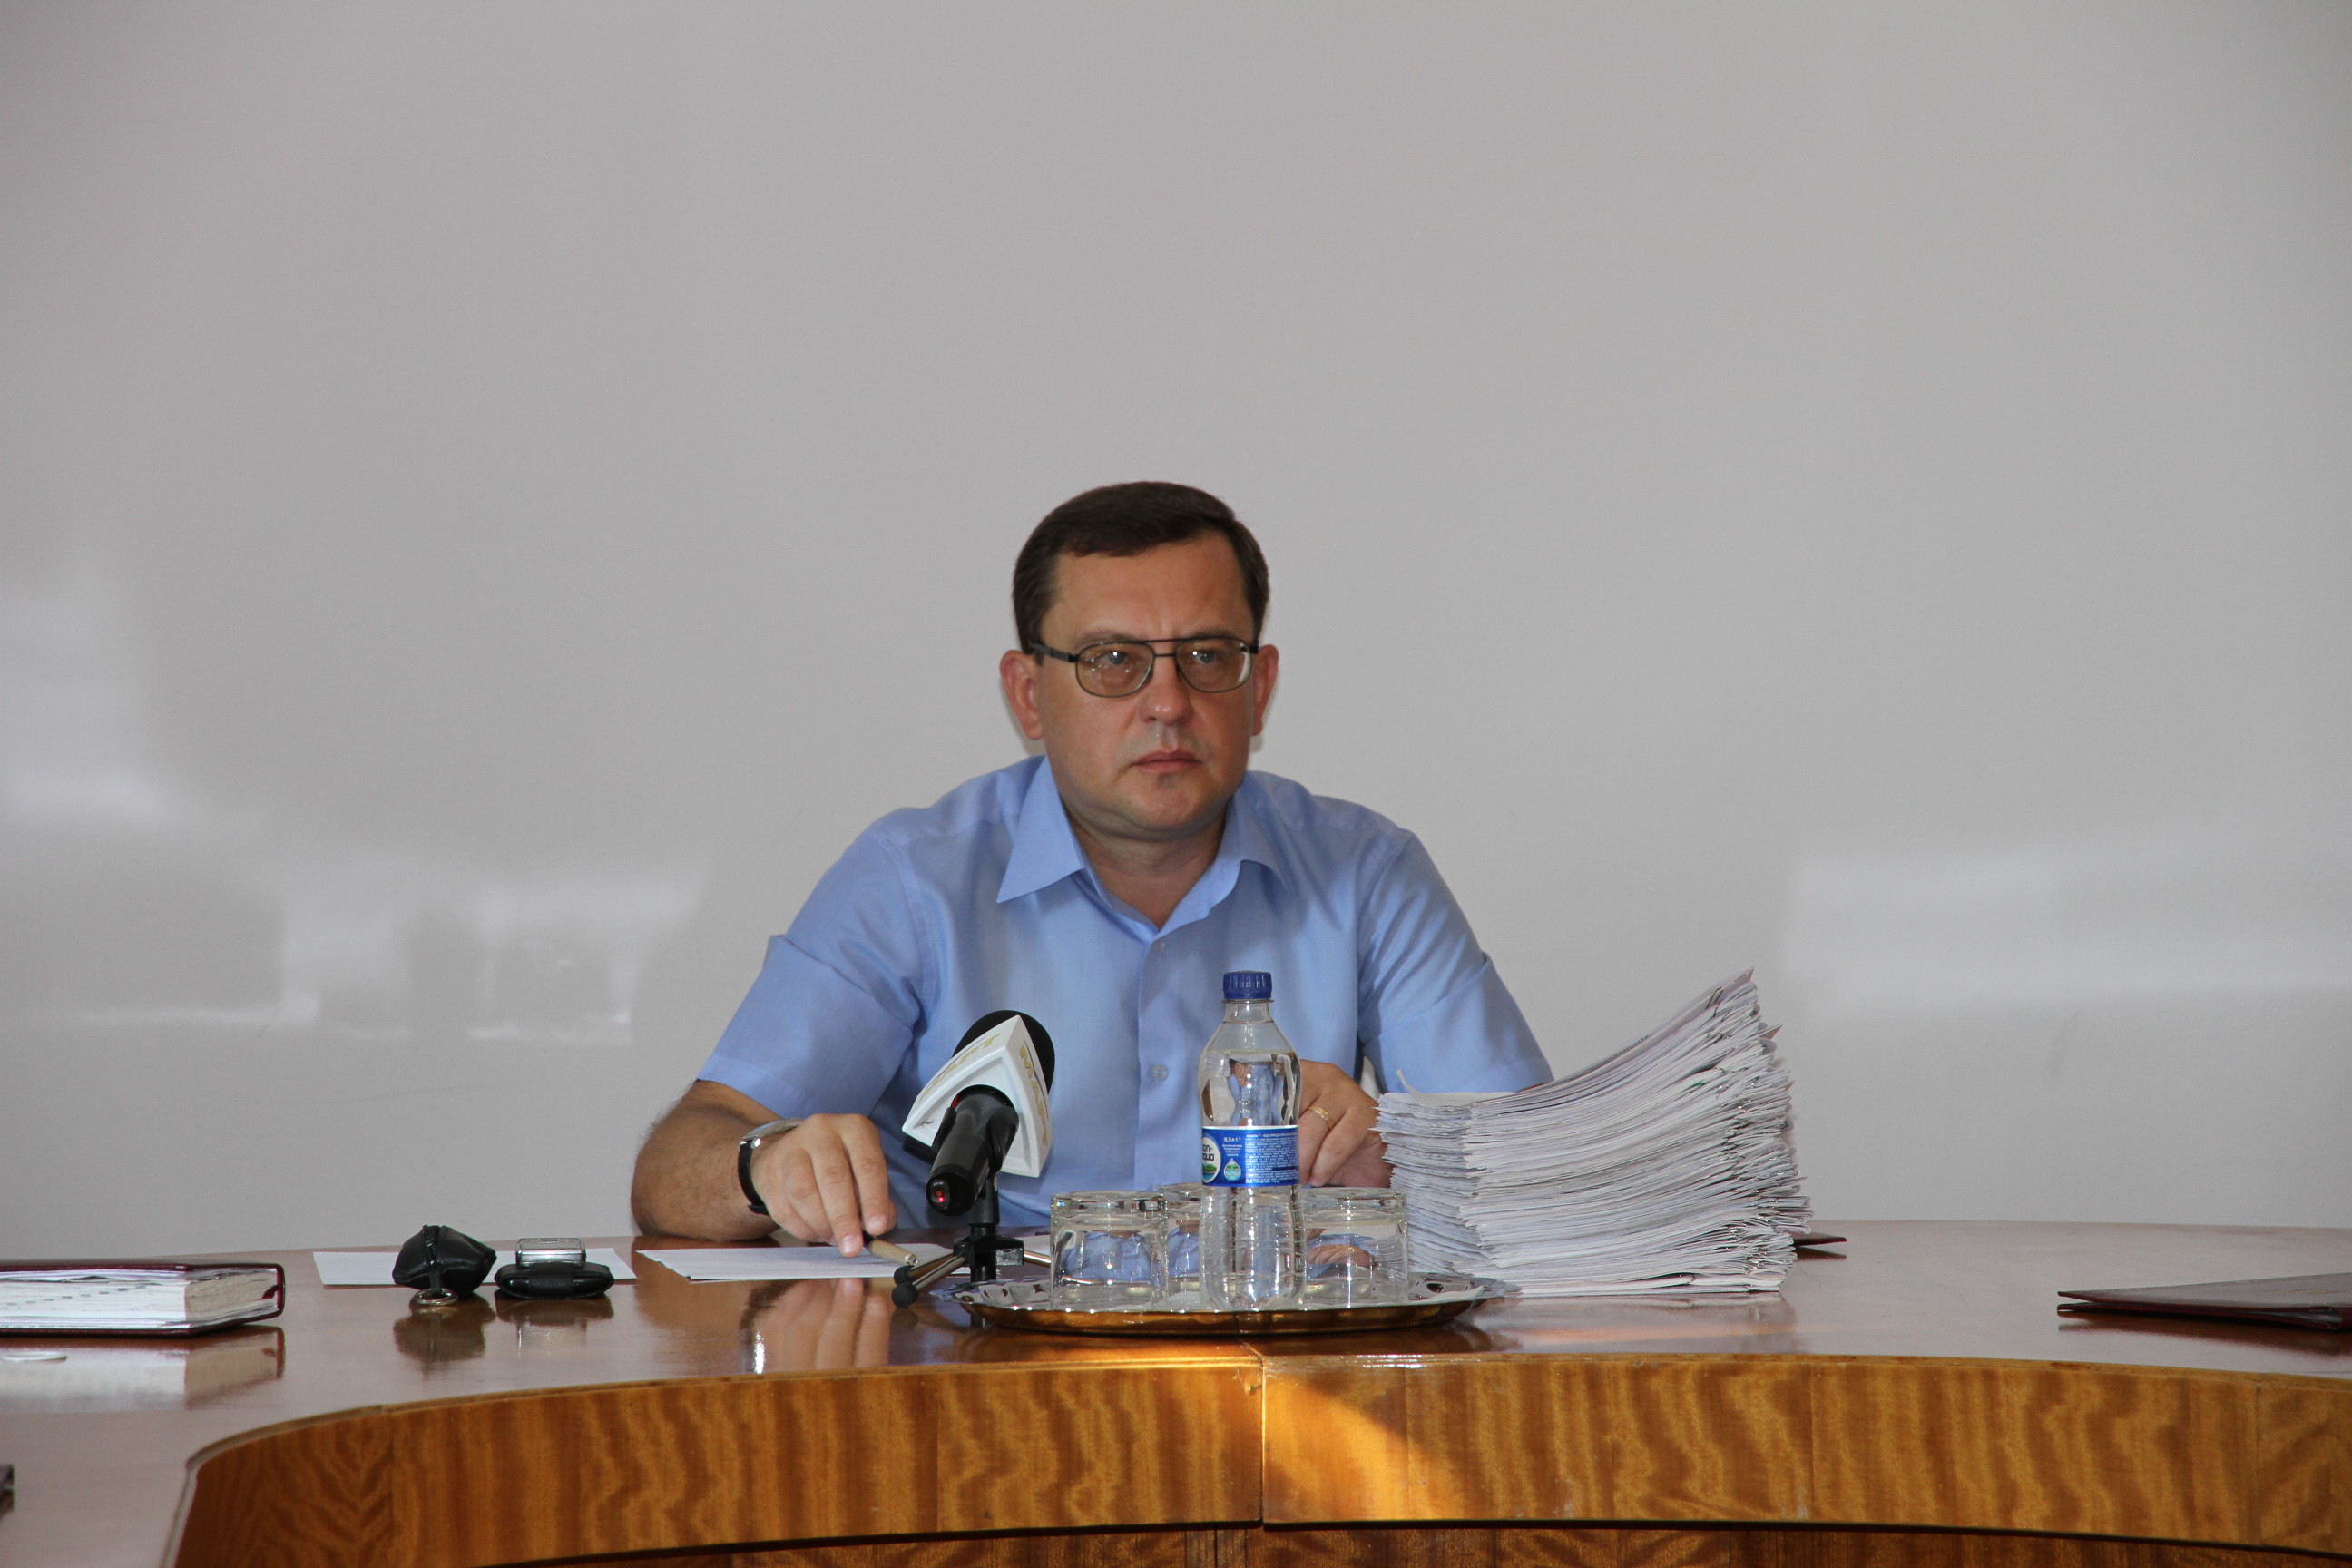 Молодежь «уломала» власти Николаева на веломаршрут в центре города  (ФОТО), фото-2